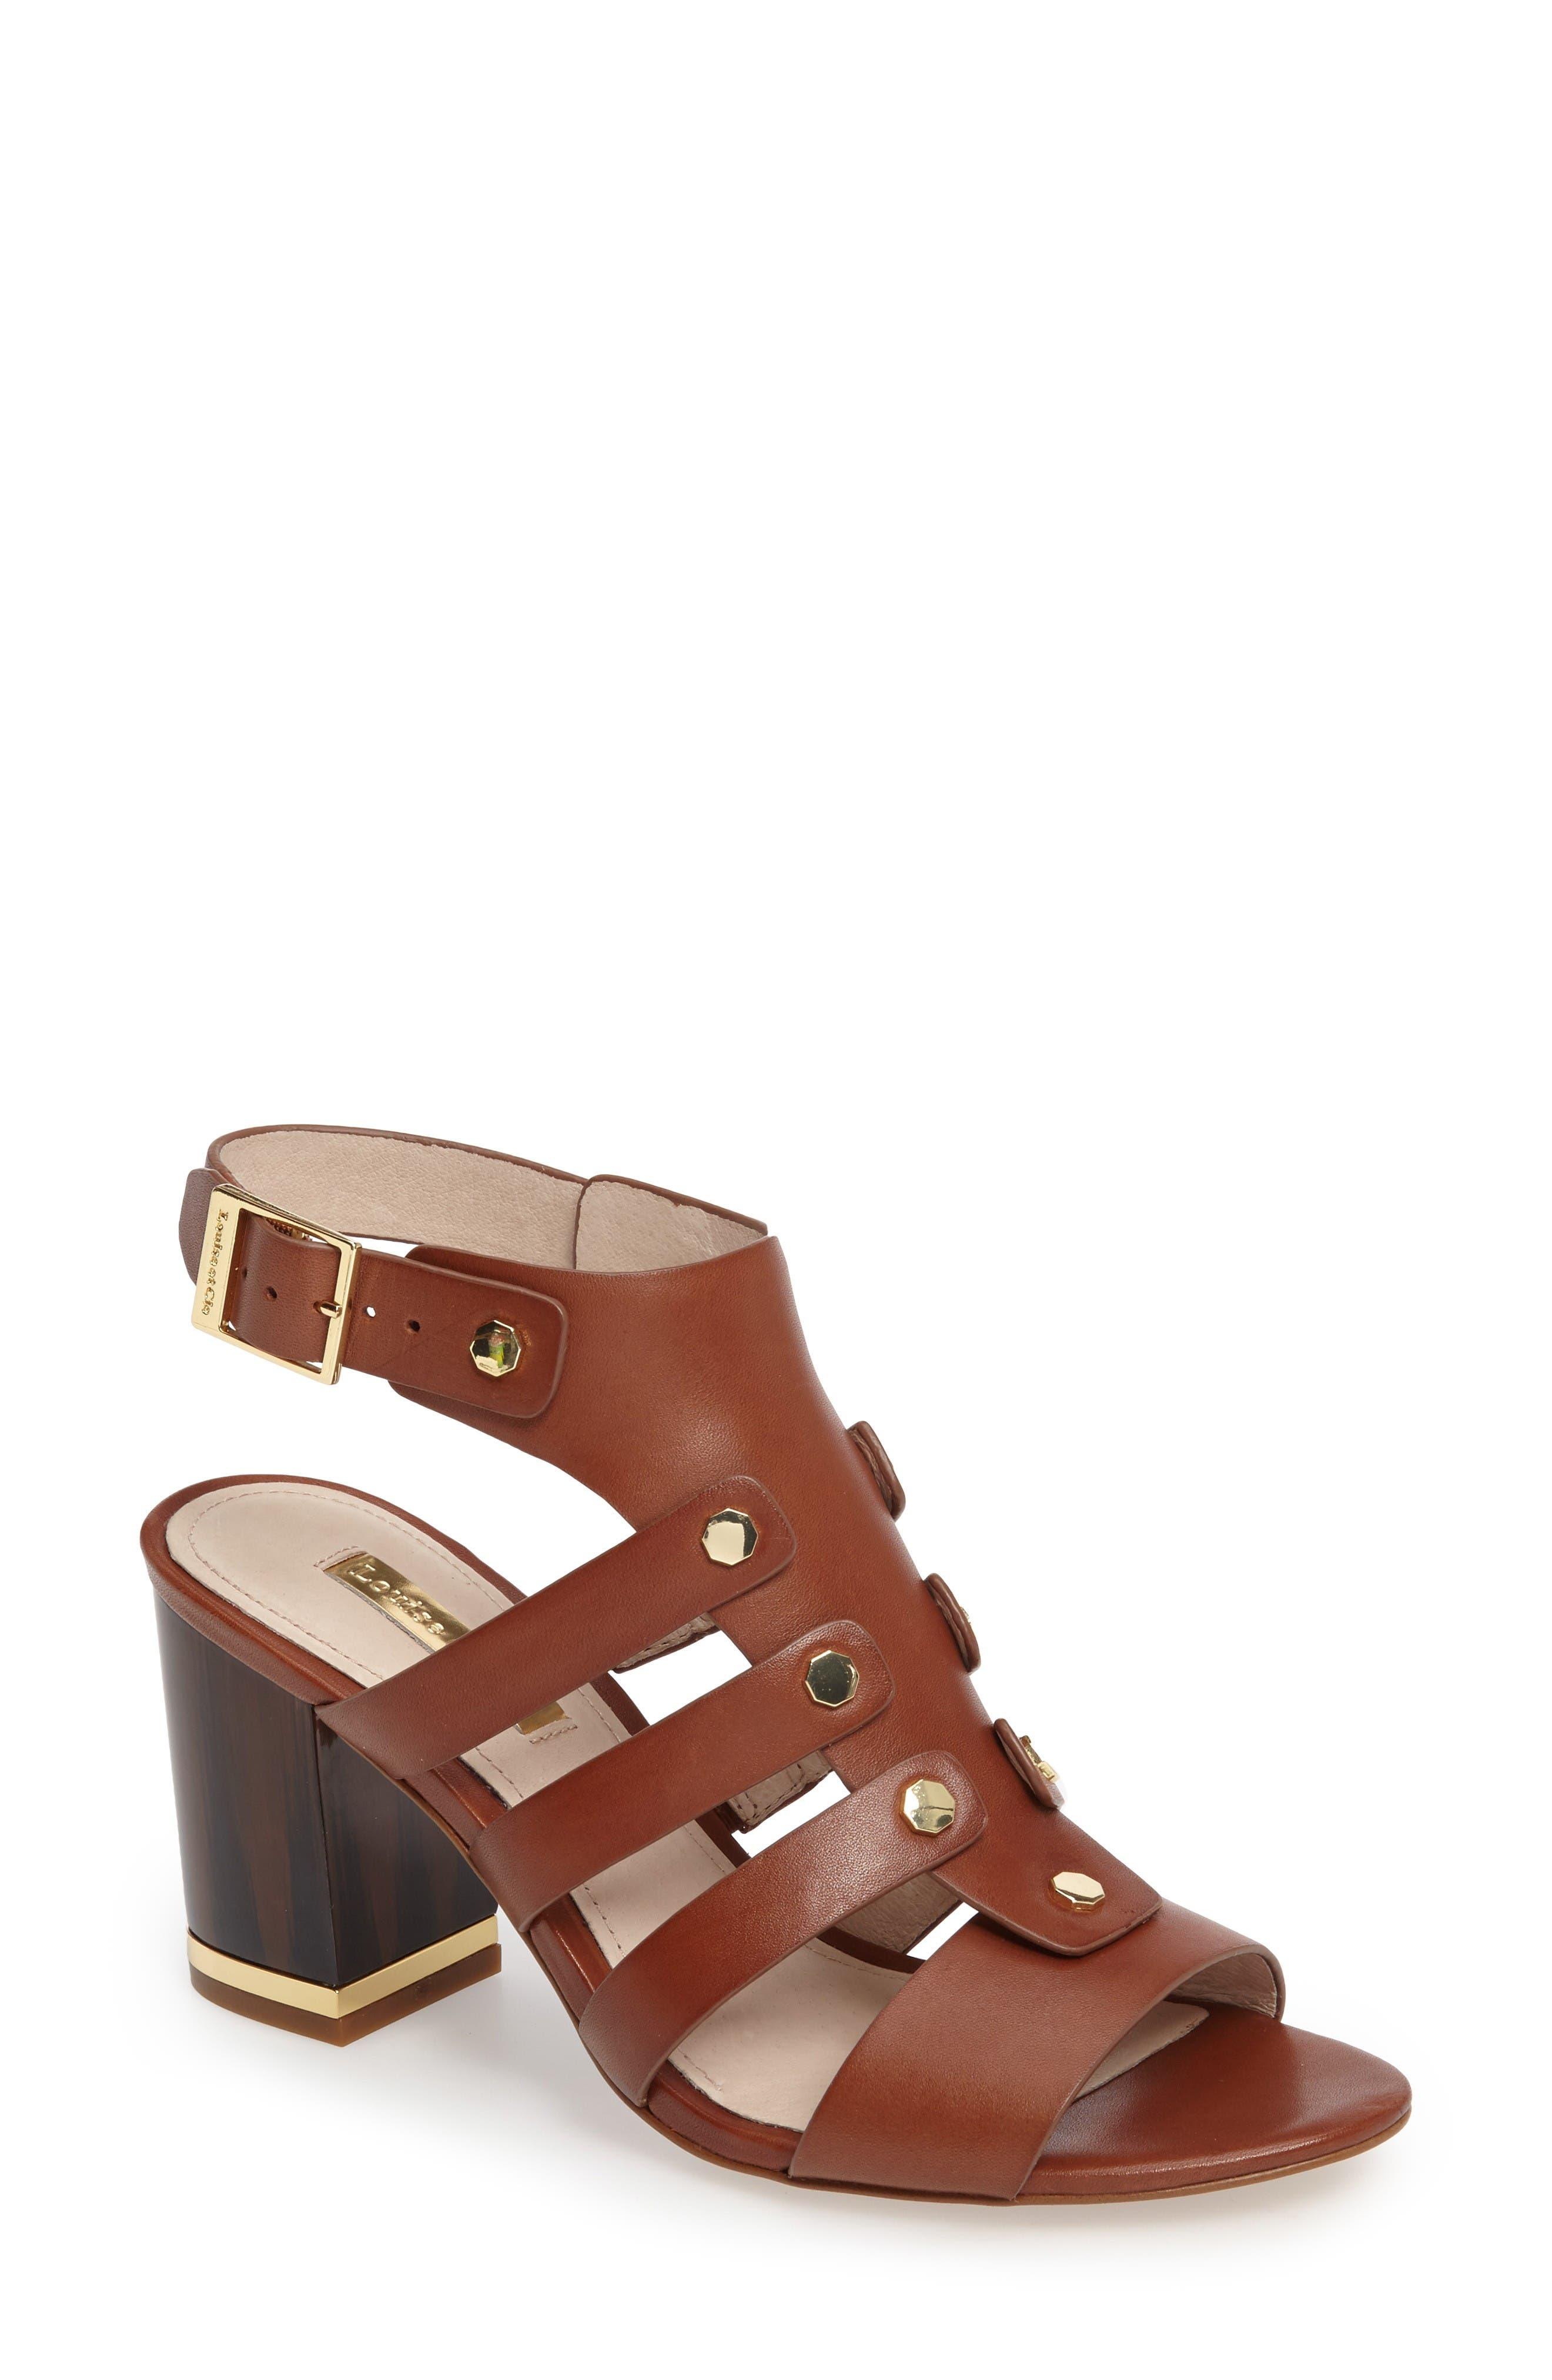 Alternate Image 1 Selected - Louise et Cie Vira Block Heel Sandal (Women)